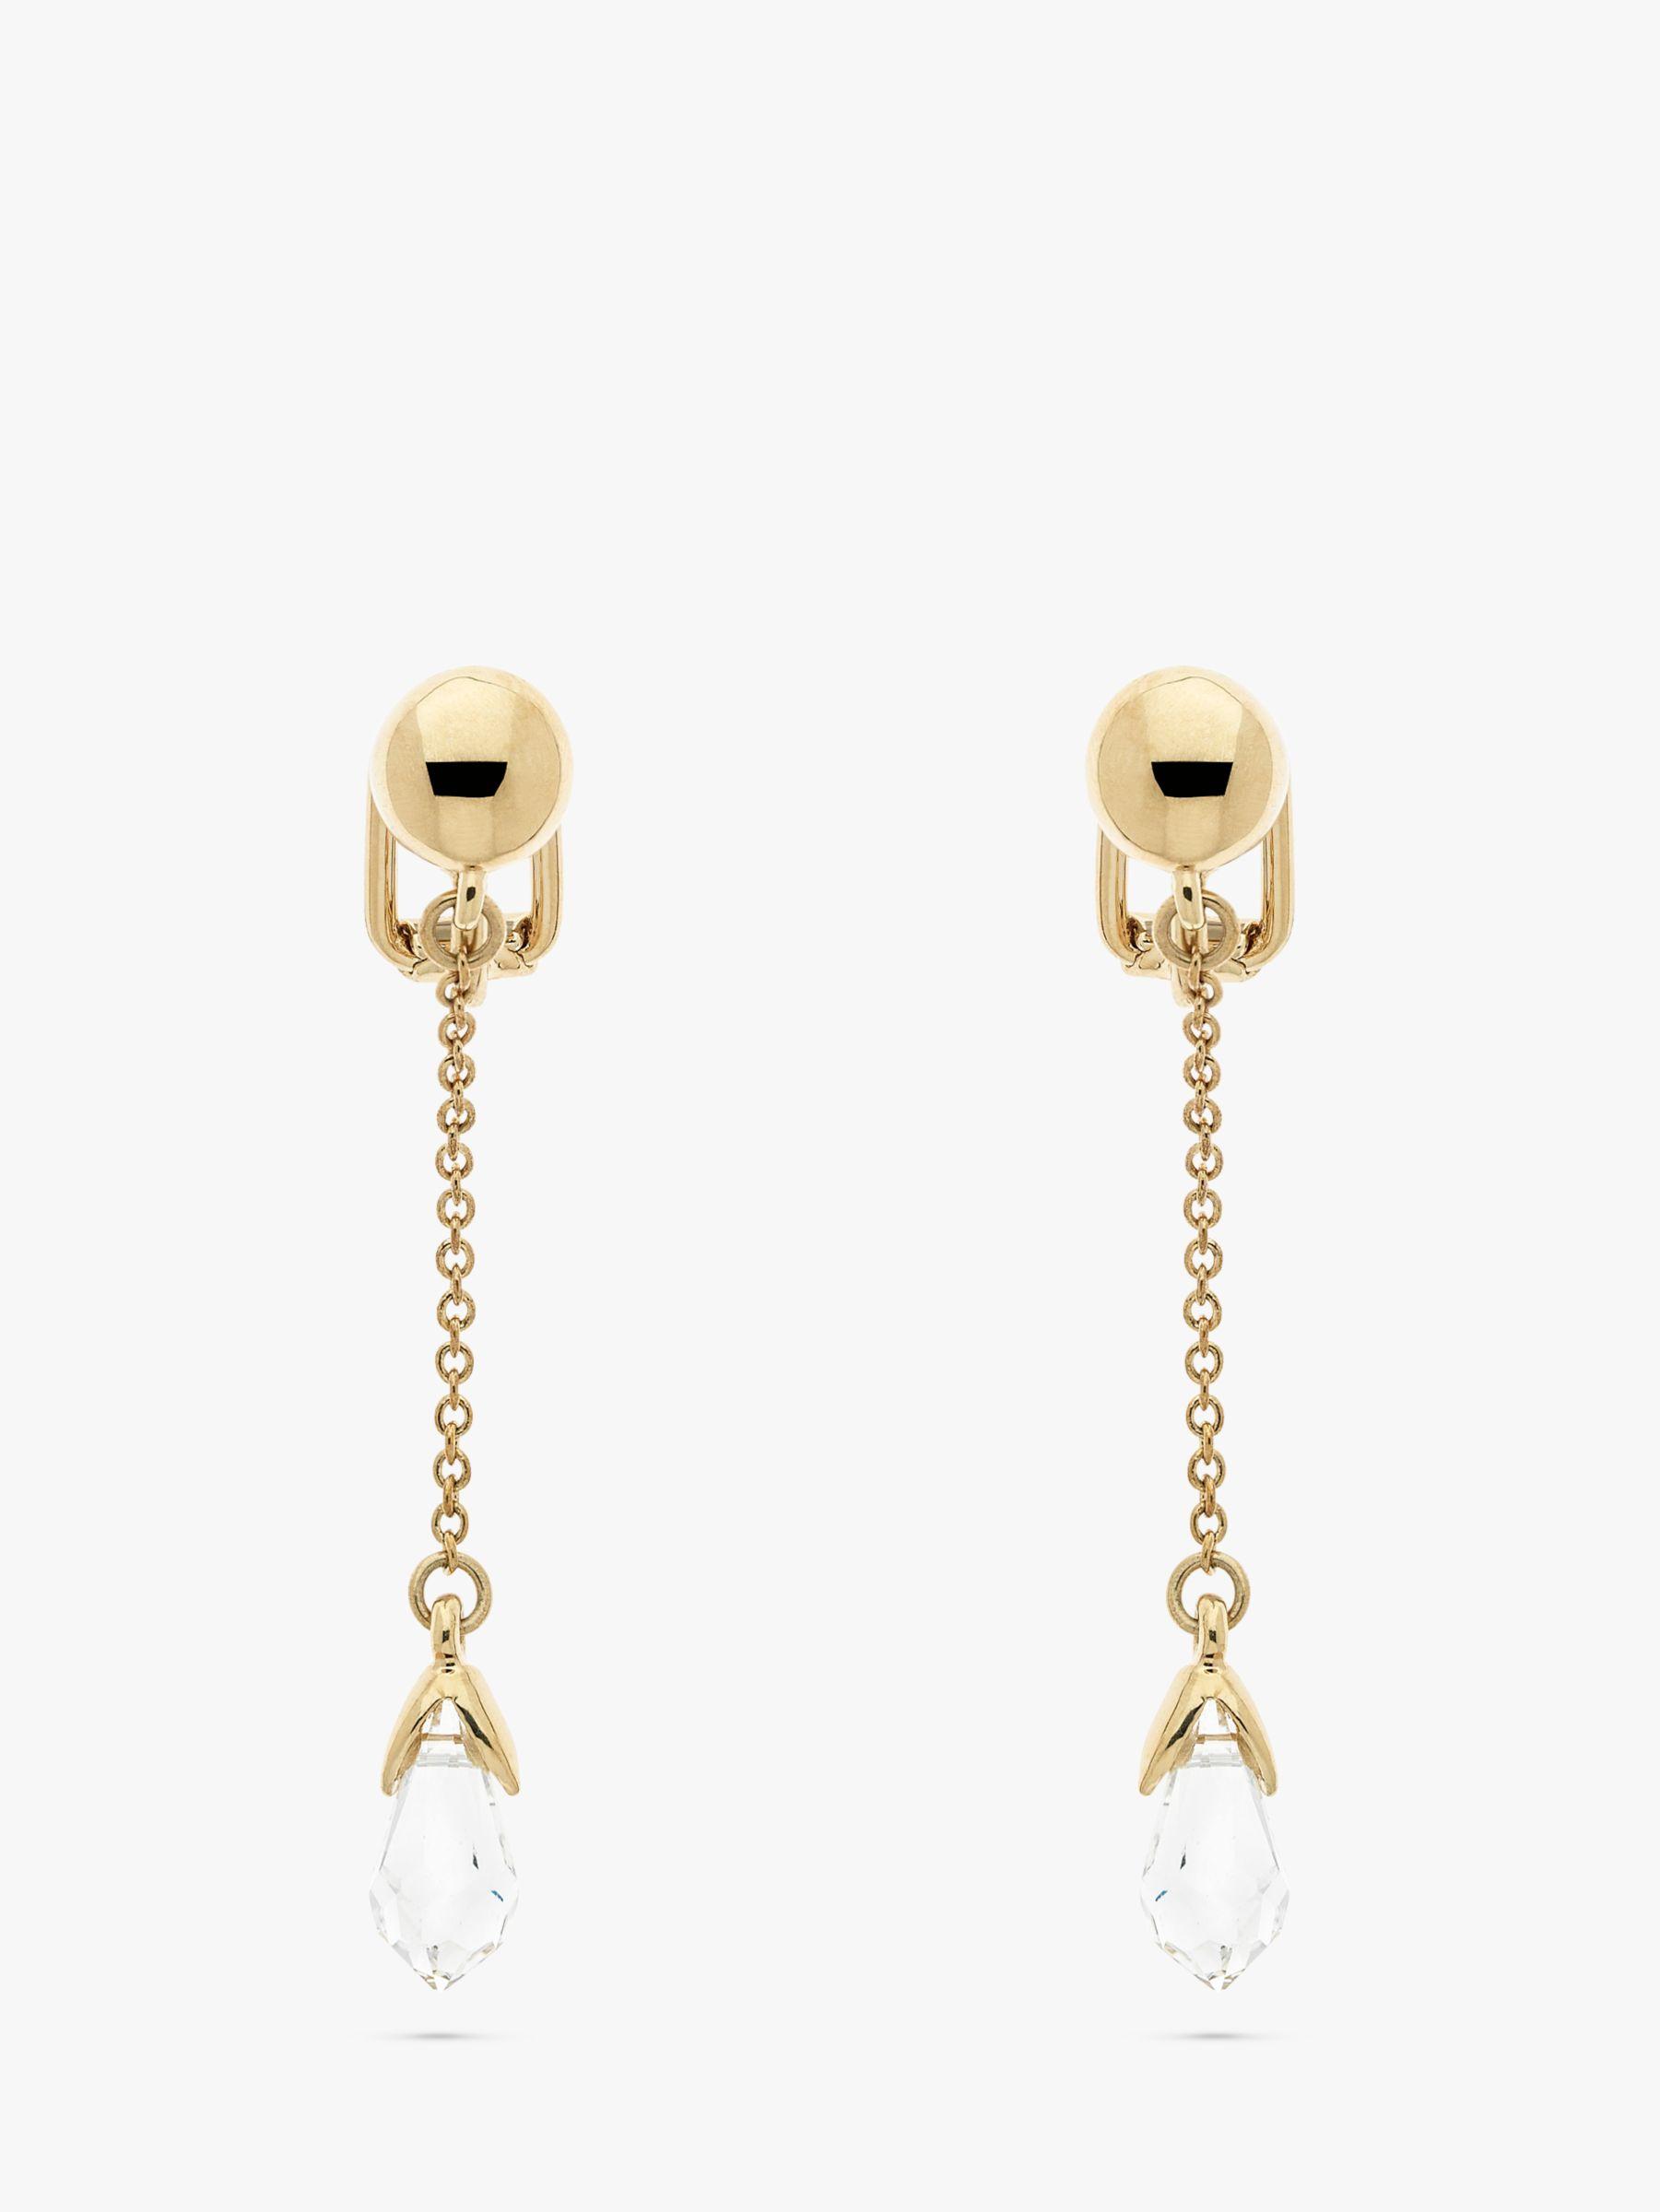 Emma Holland Swarovski Crystal Drop Chain Clip On Earrings